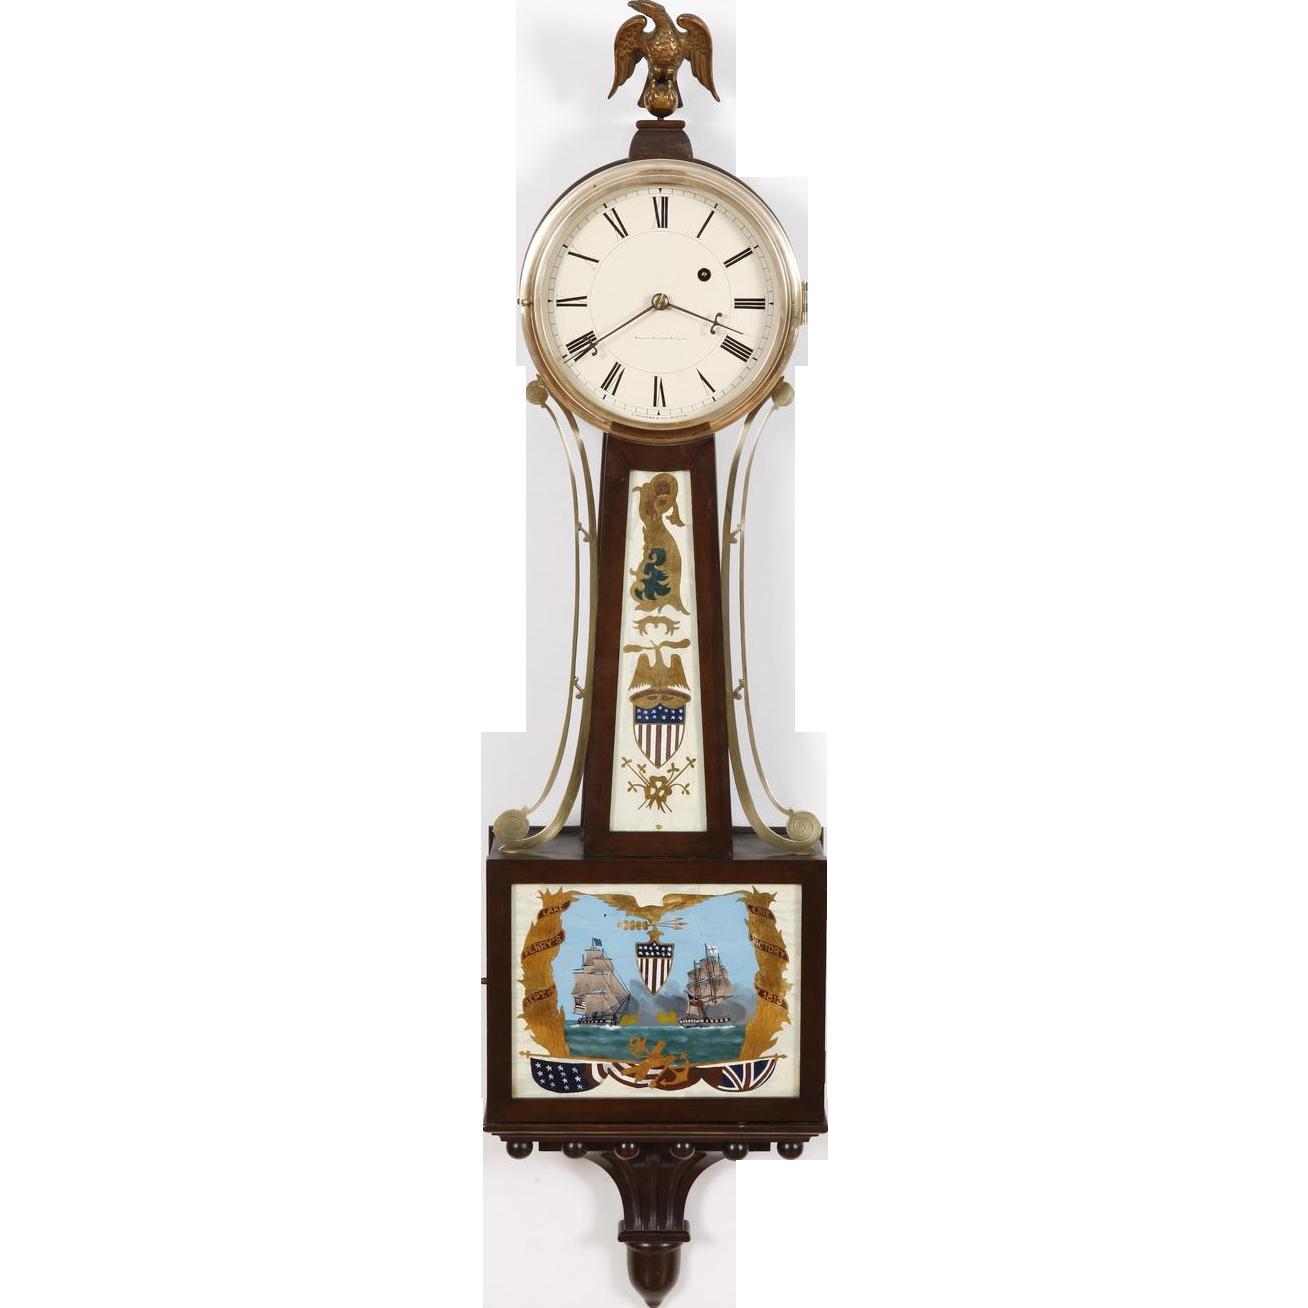 E Howard Boston 95 Weight Driven Banjo Clock C 1925 Signed Dial Works At Rubylane Com Vintagebeginshere Vintageclo Clock Vintage Clock Antique Wall Clock